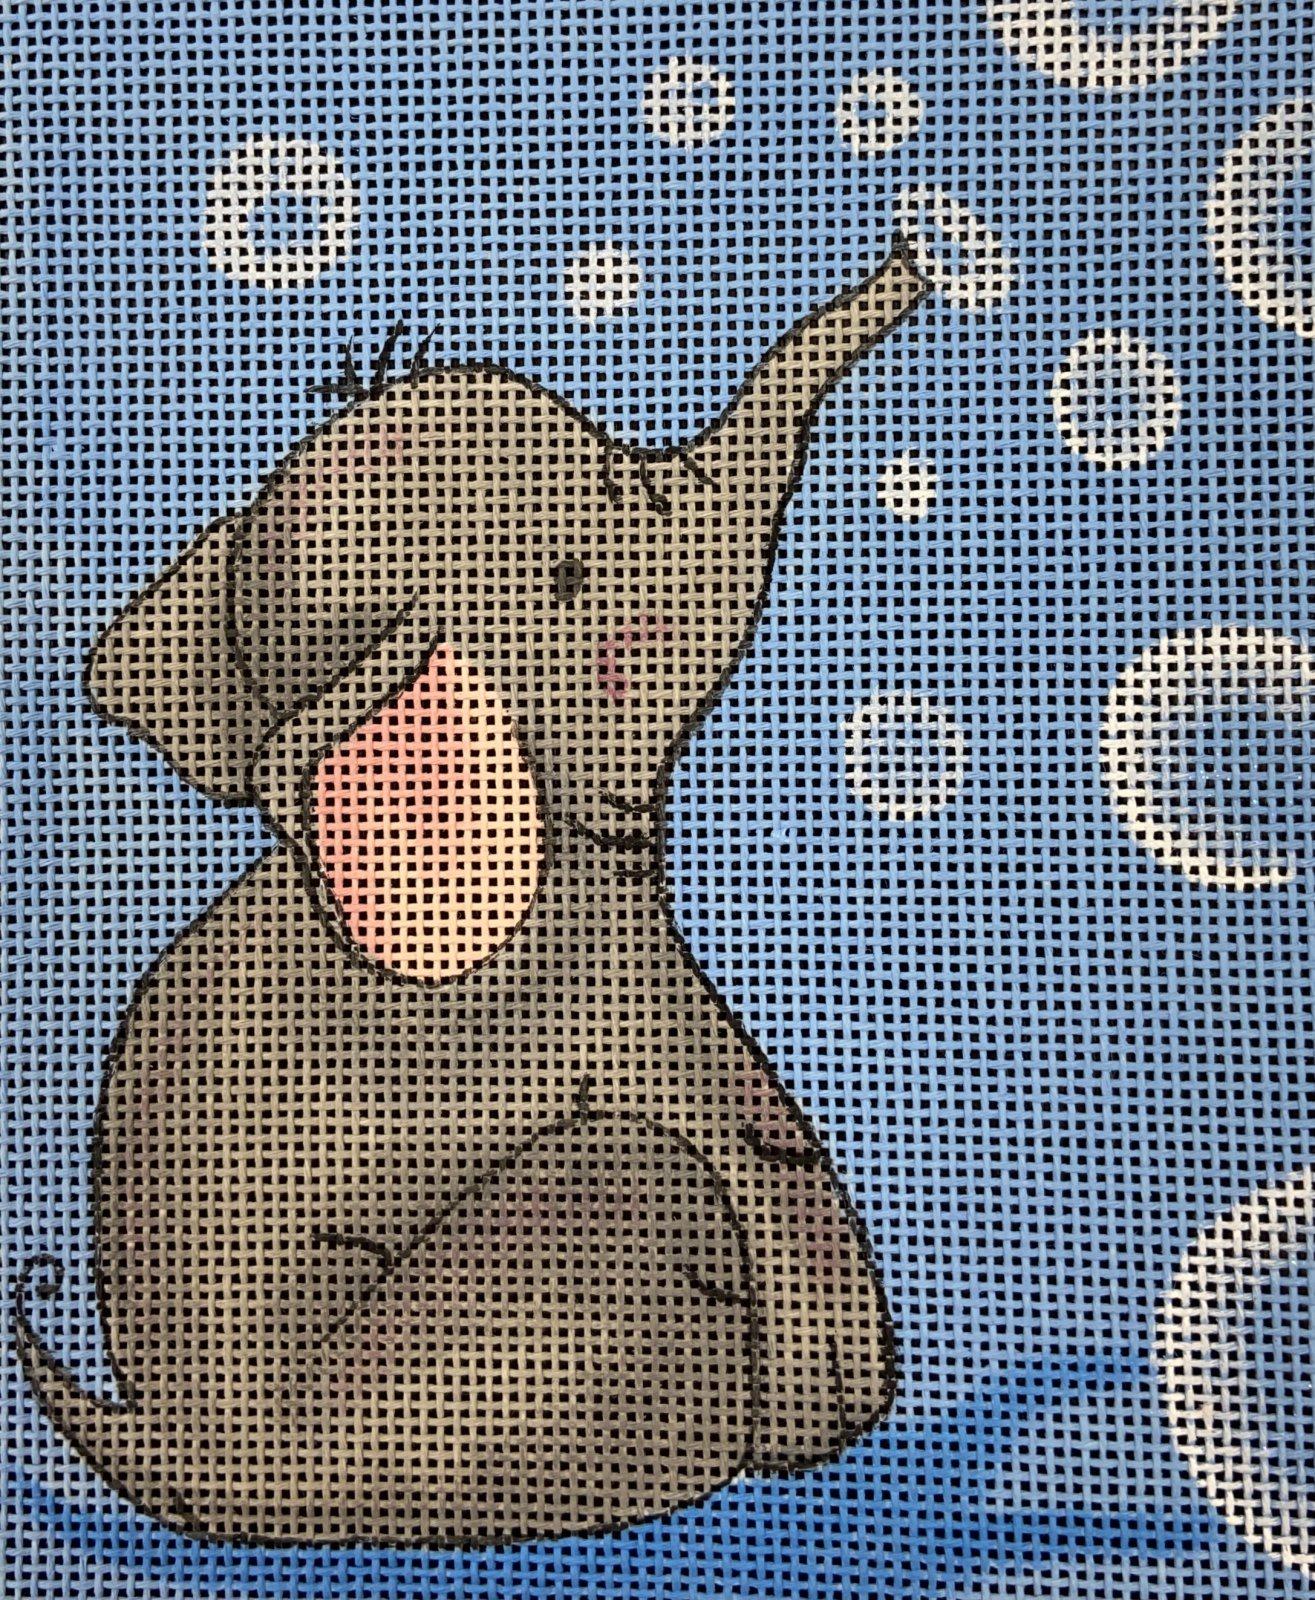 ONY4 Elephant Blowing Bubbles Oasis Needlepoint